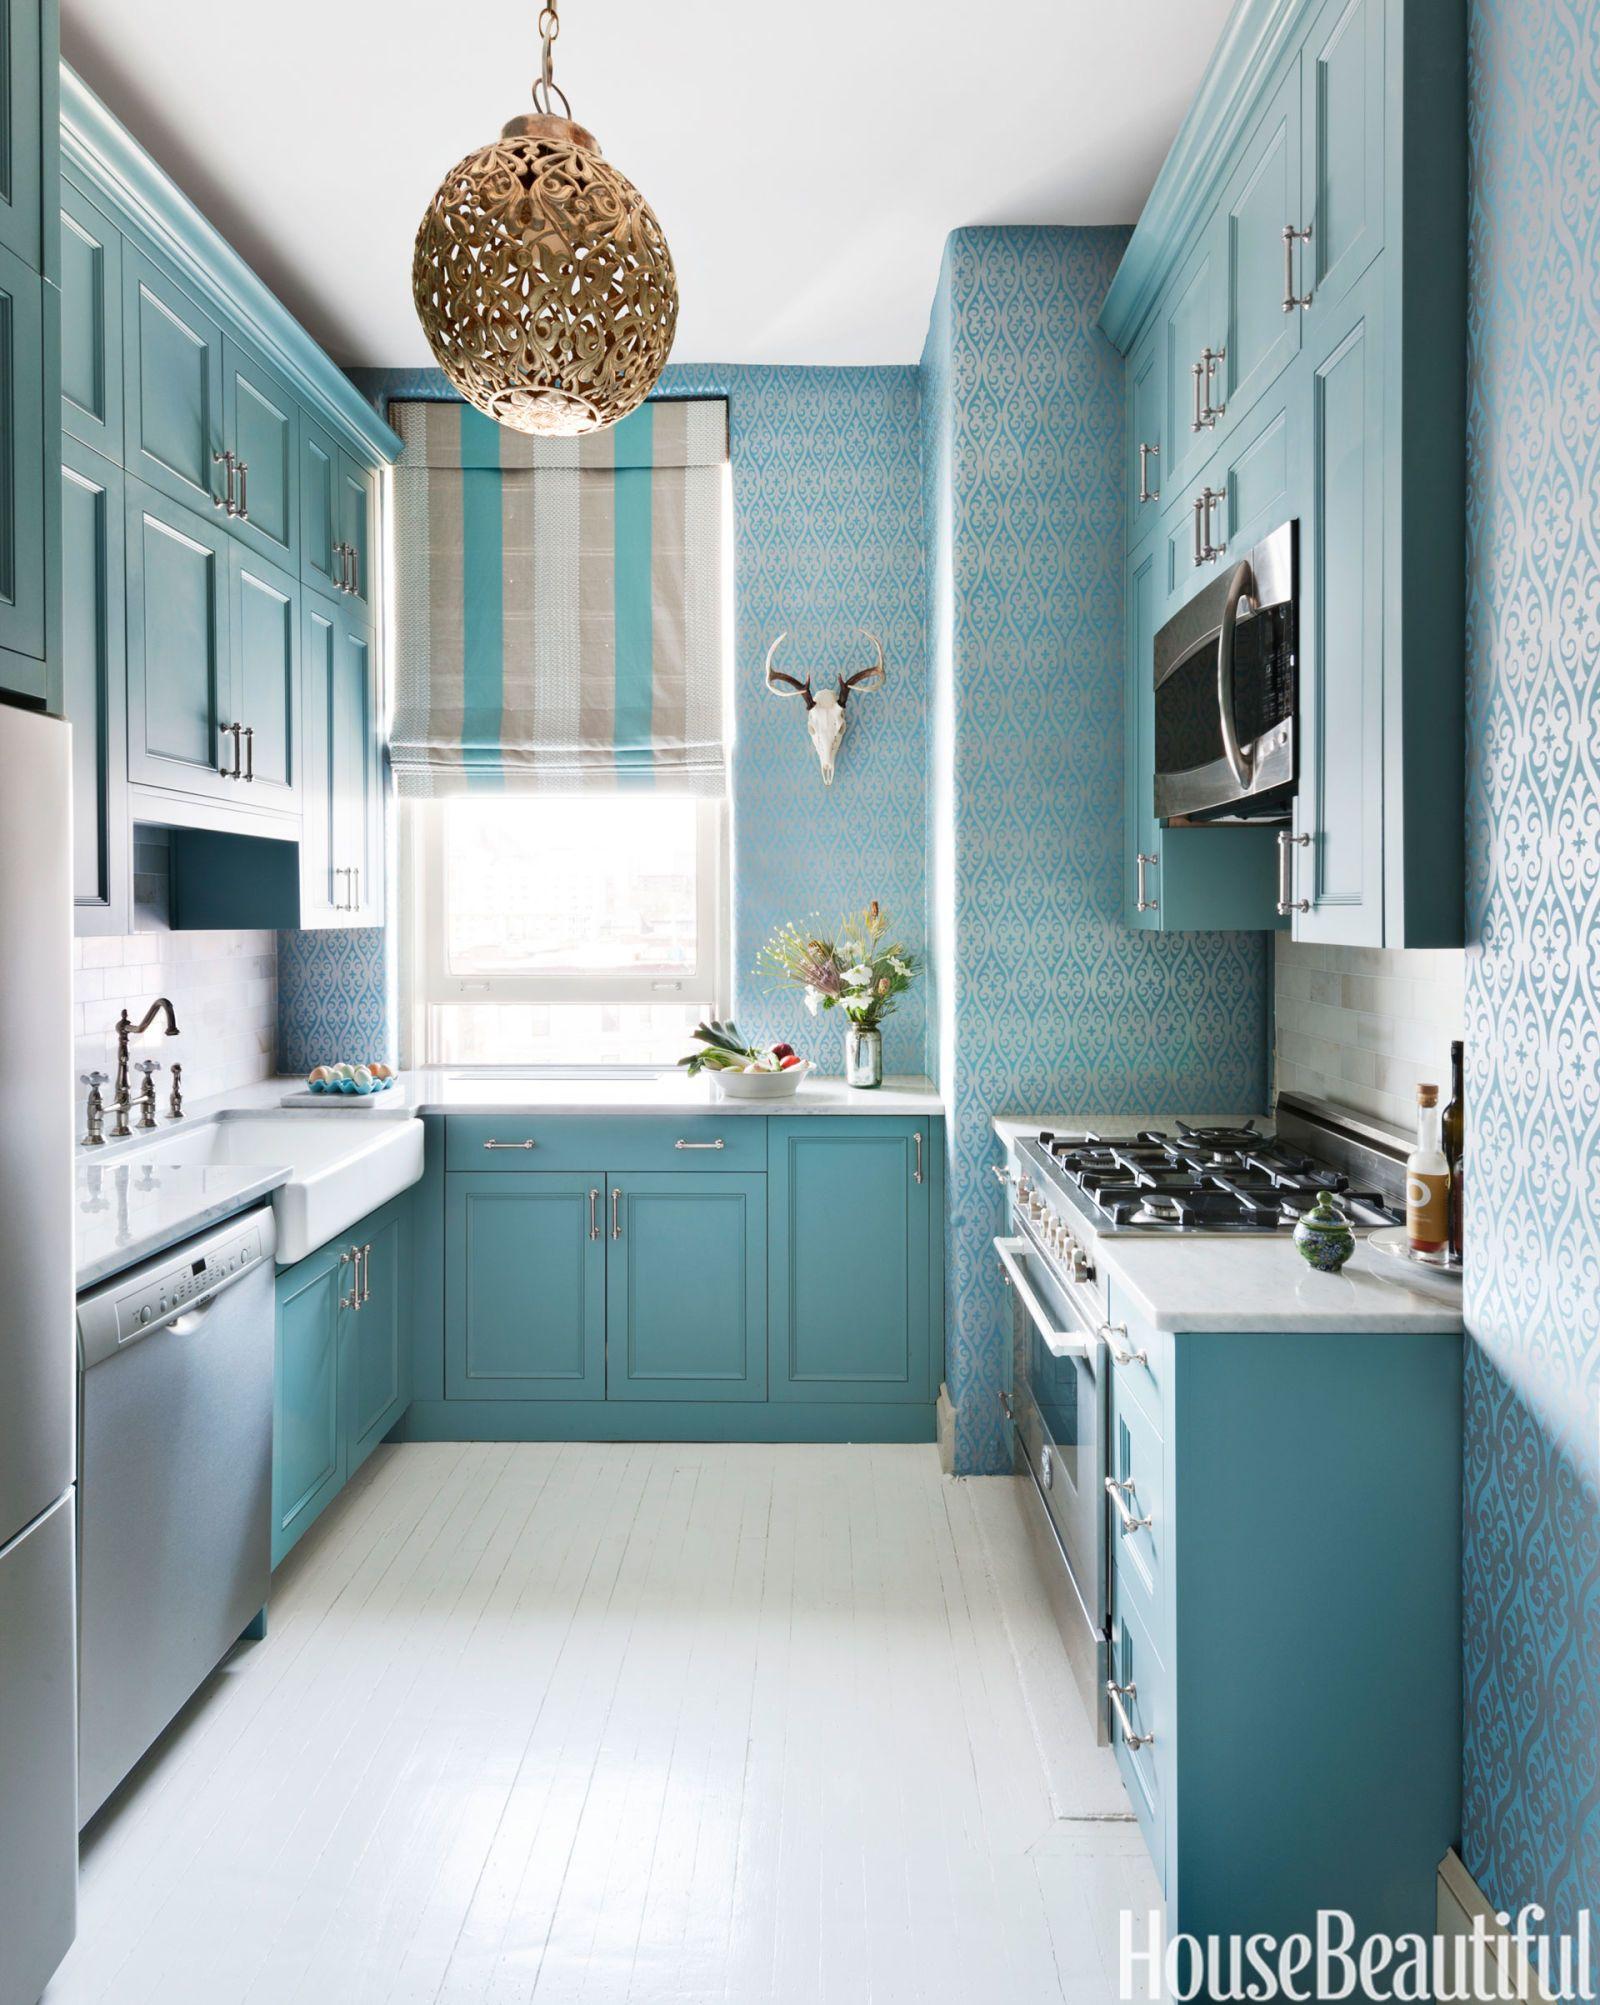 Best Kitchens of 2013 | Elegant, Remodeled kitchens and Kitchens